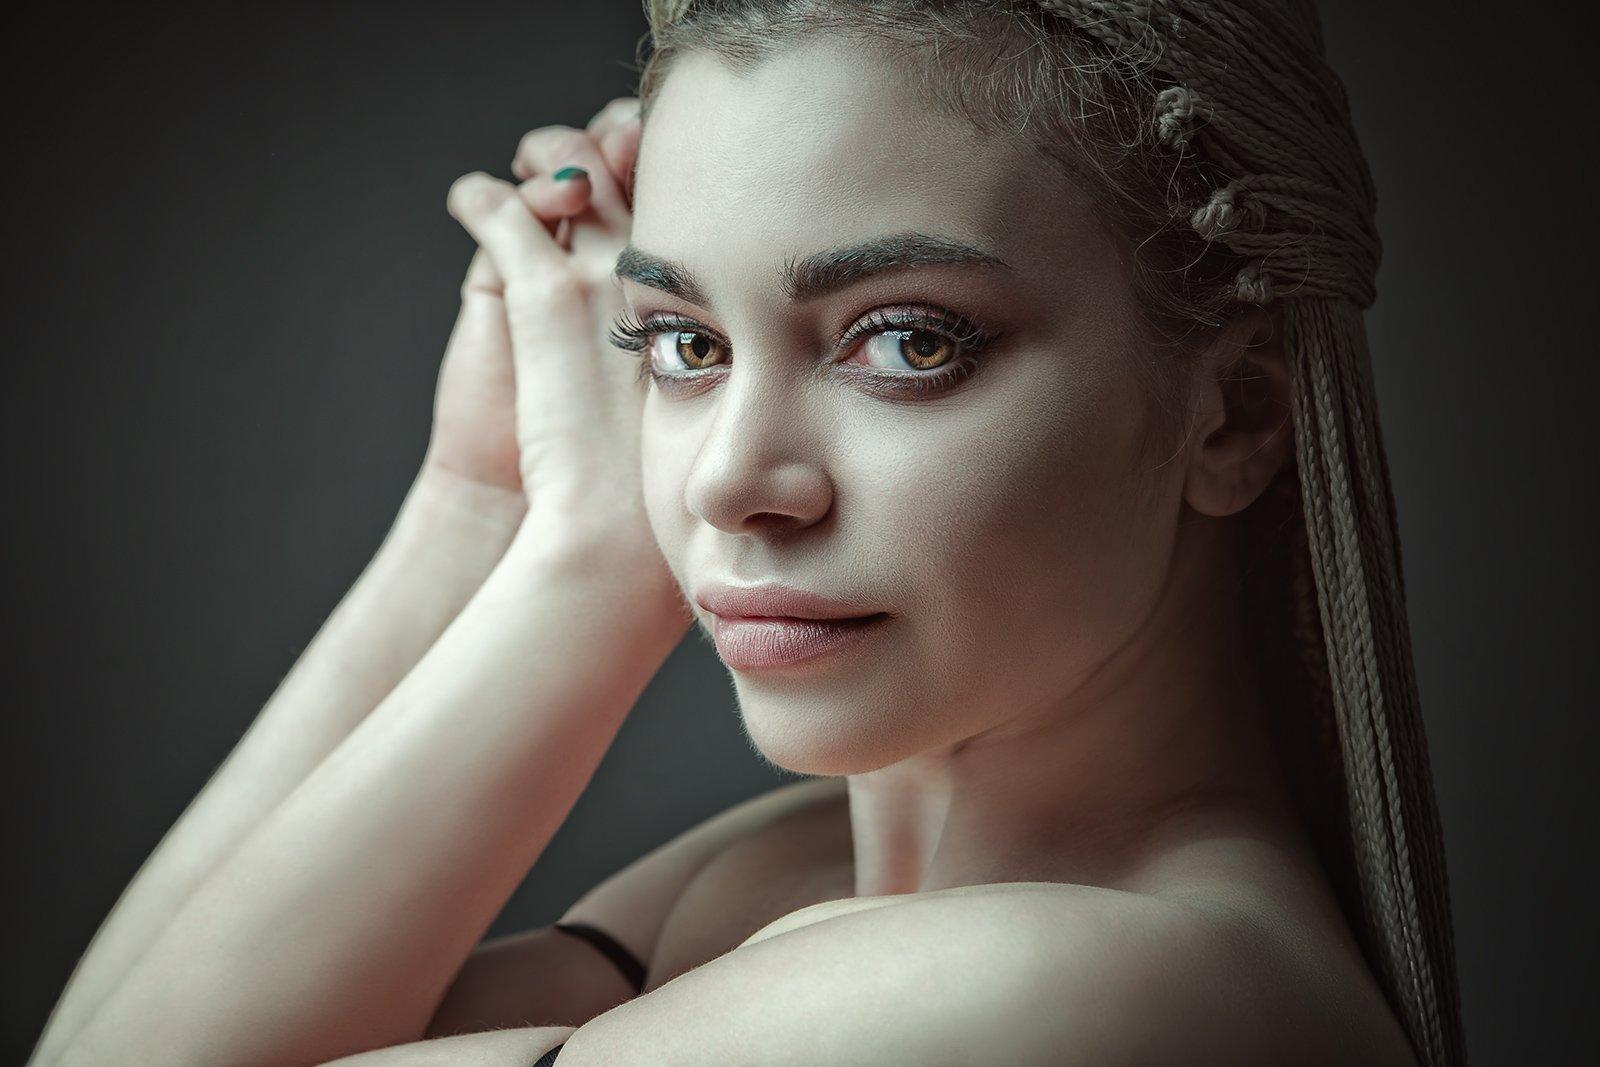 blonde, female, beauty, portrait, nude, naked, sensual, sensuality, feminine, woman, adult, adorable, mood, people, look, dreadhair, Дмитрий Толоконов